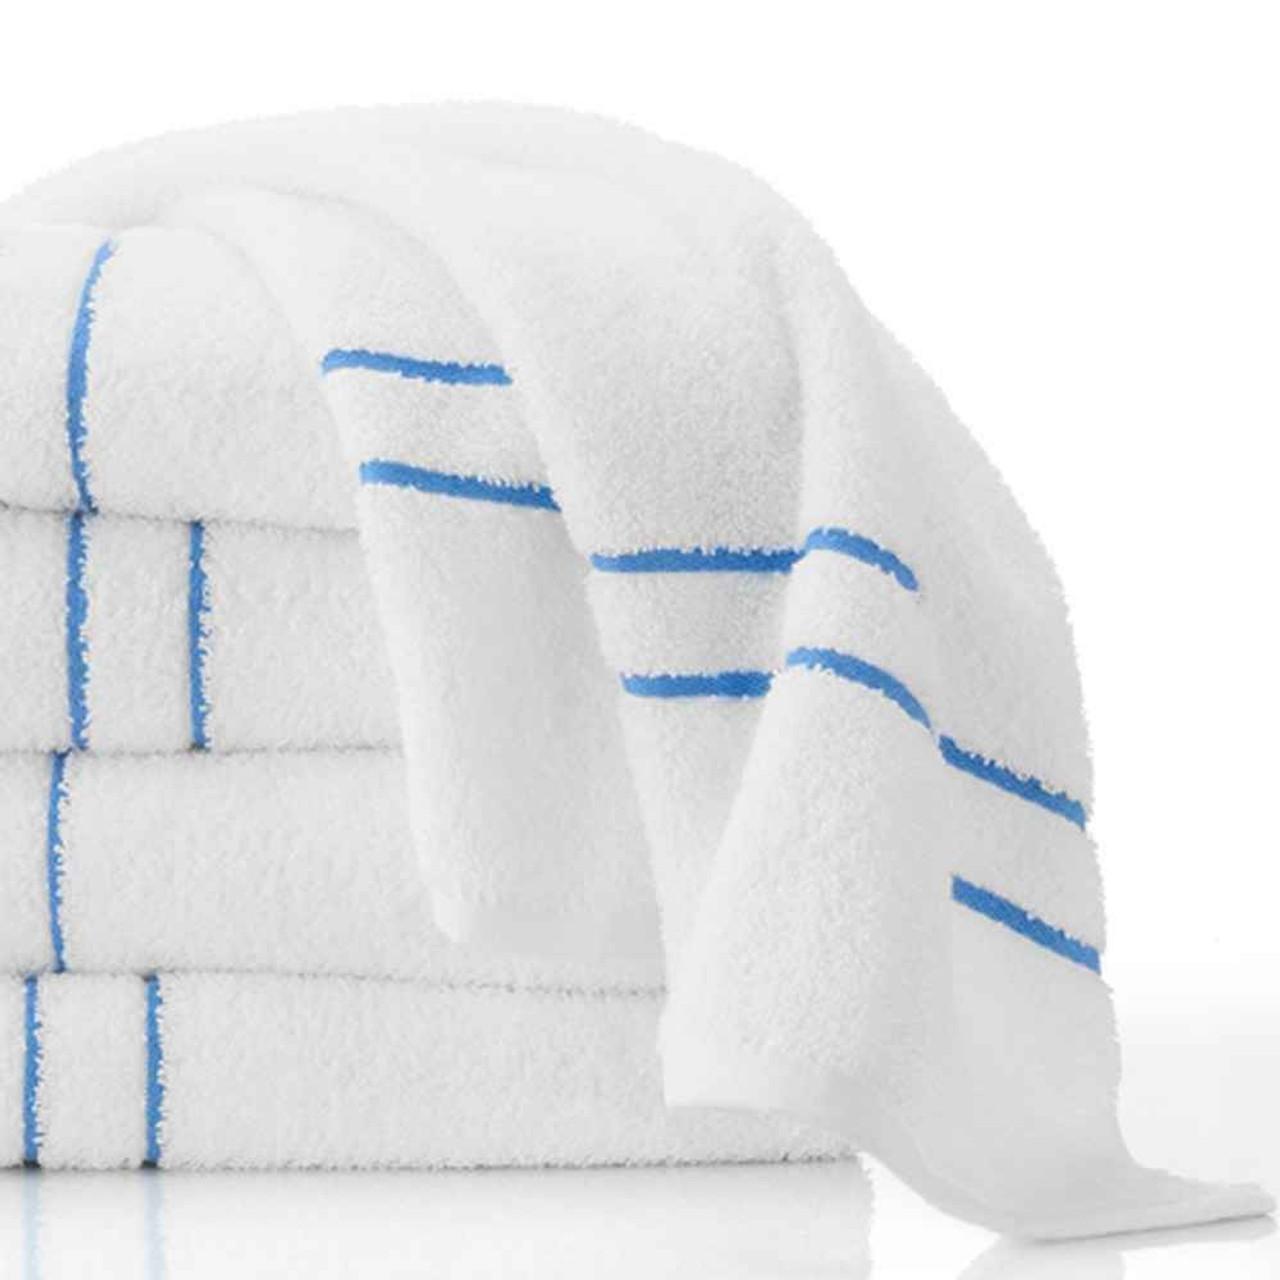 WestPoint/Martex Westpoint or Martex Morning Glory or Pool Towel or 24W X 50L or 10.5 Lbs/Dz or 12 Pack